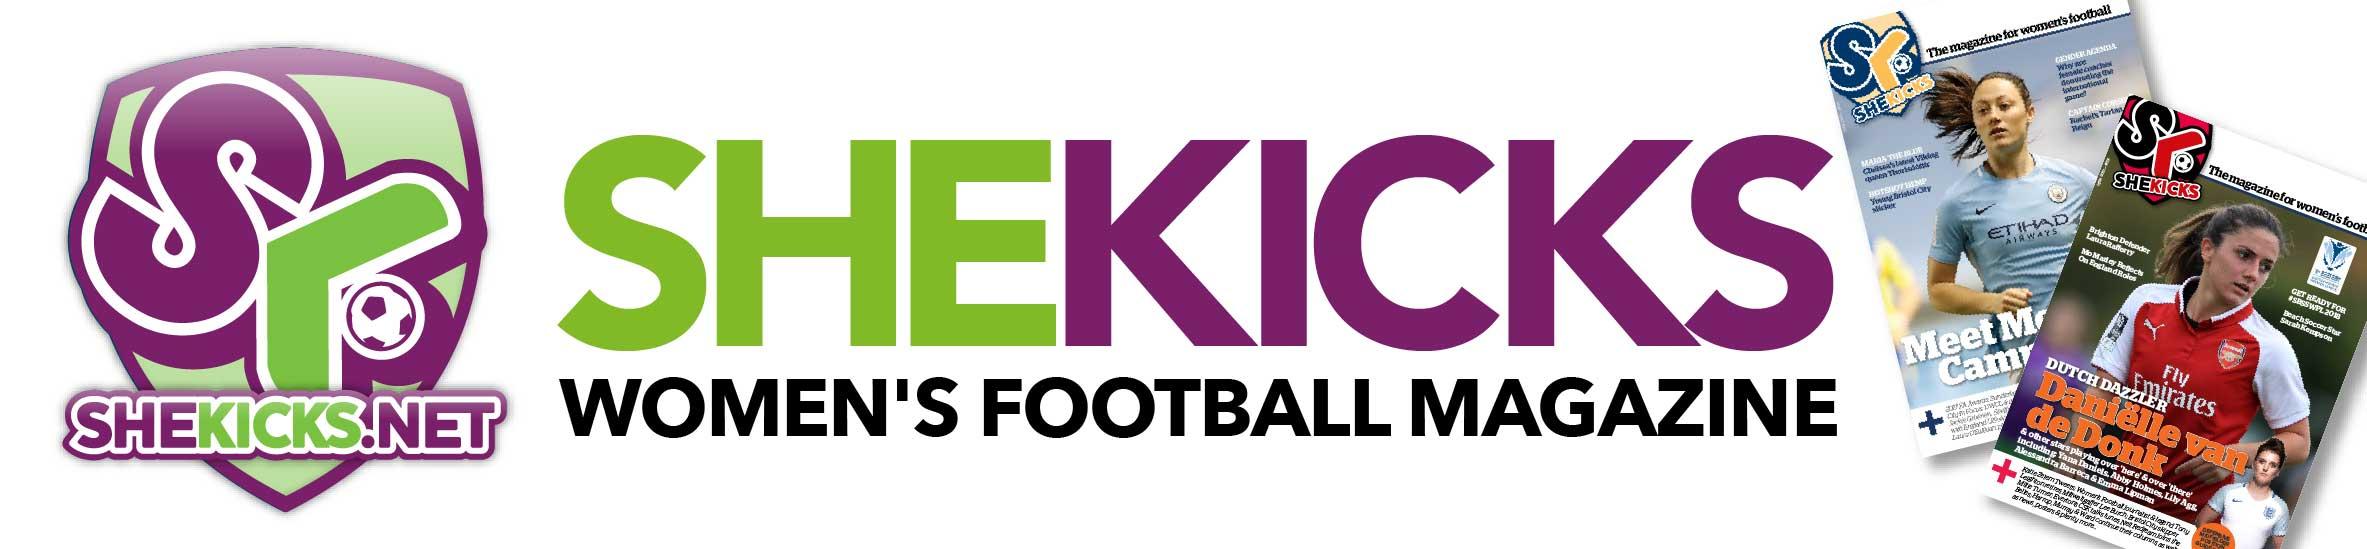 She Kicks Women's Football Magazine